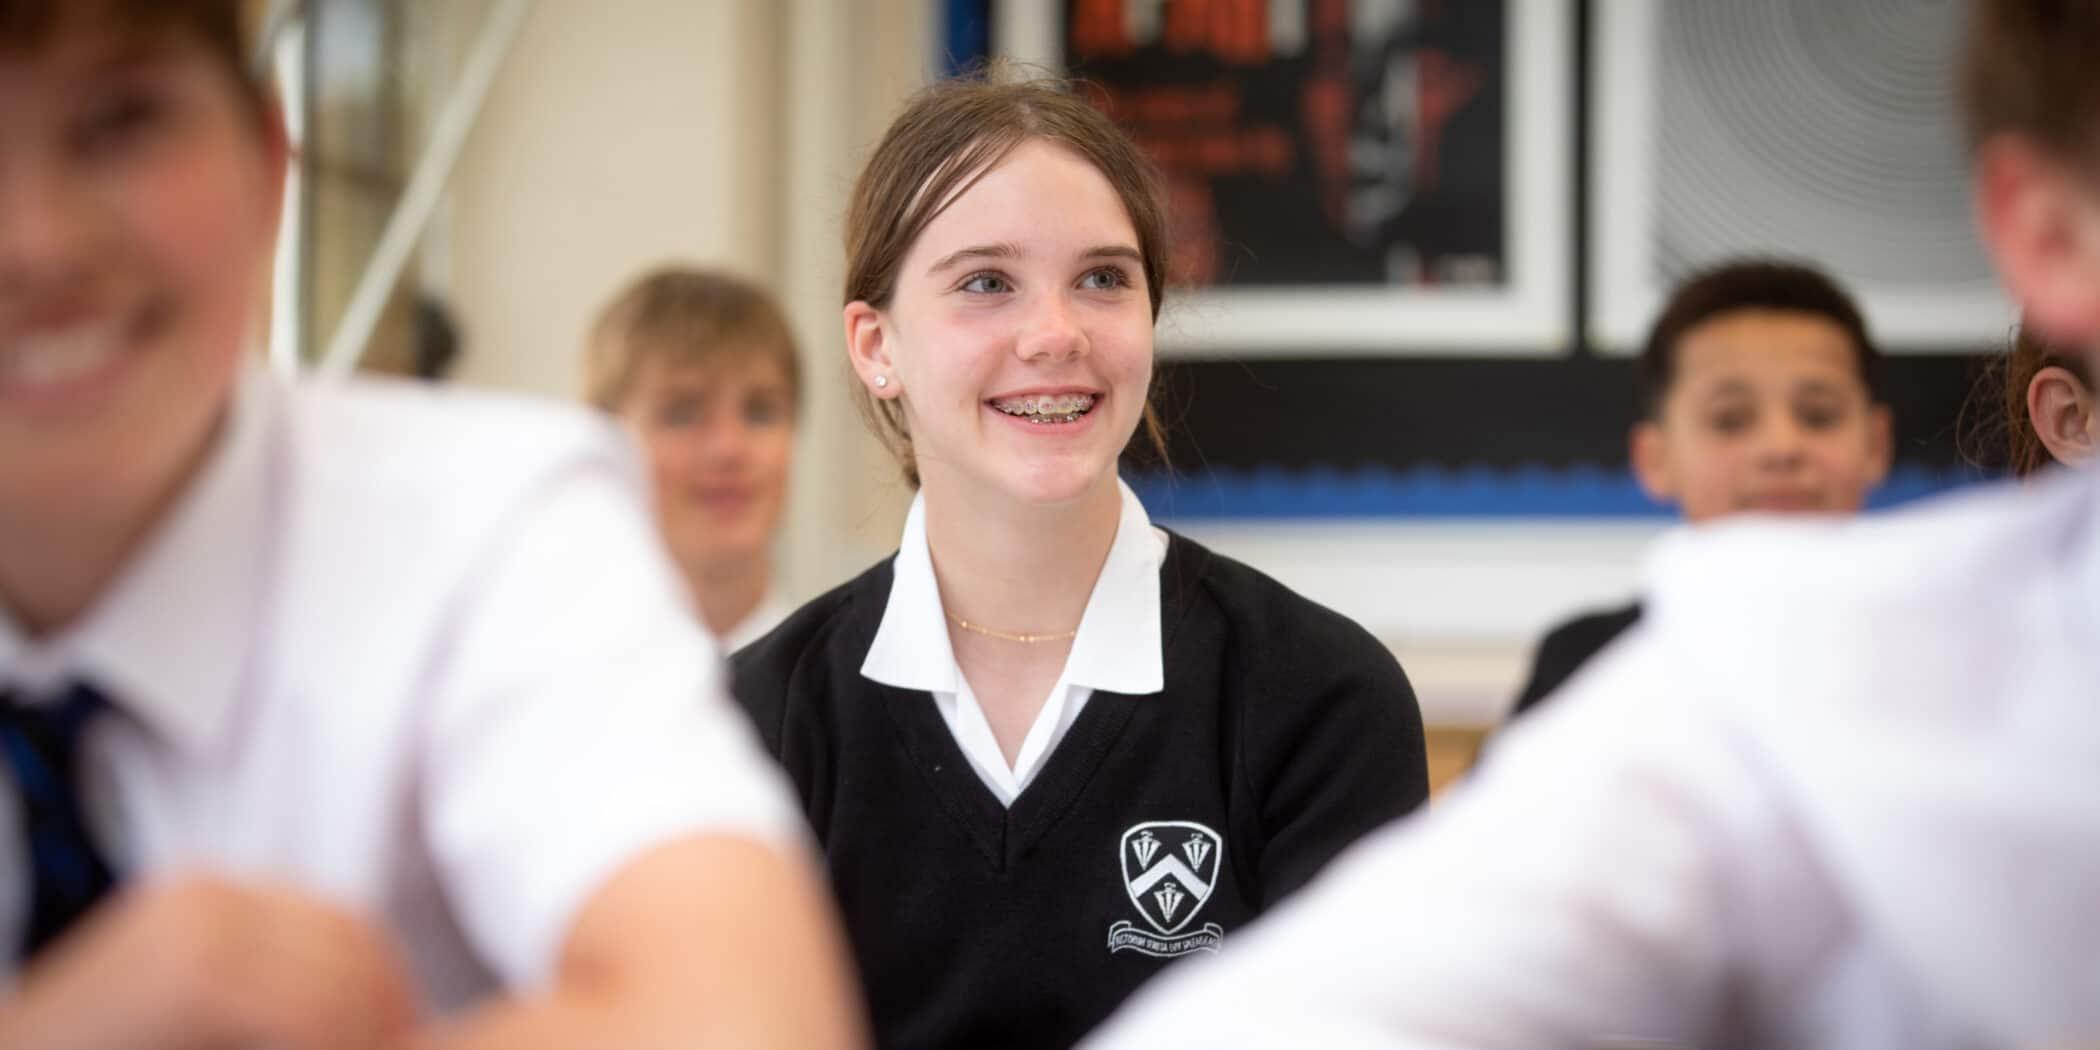 Bloxham school student welcoming smile